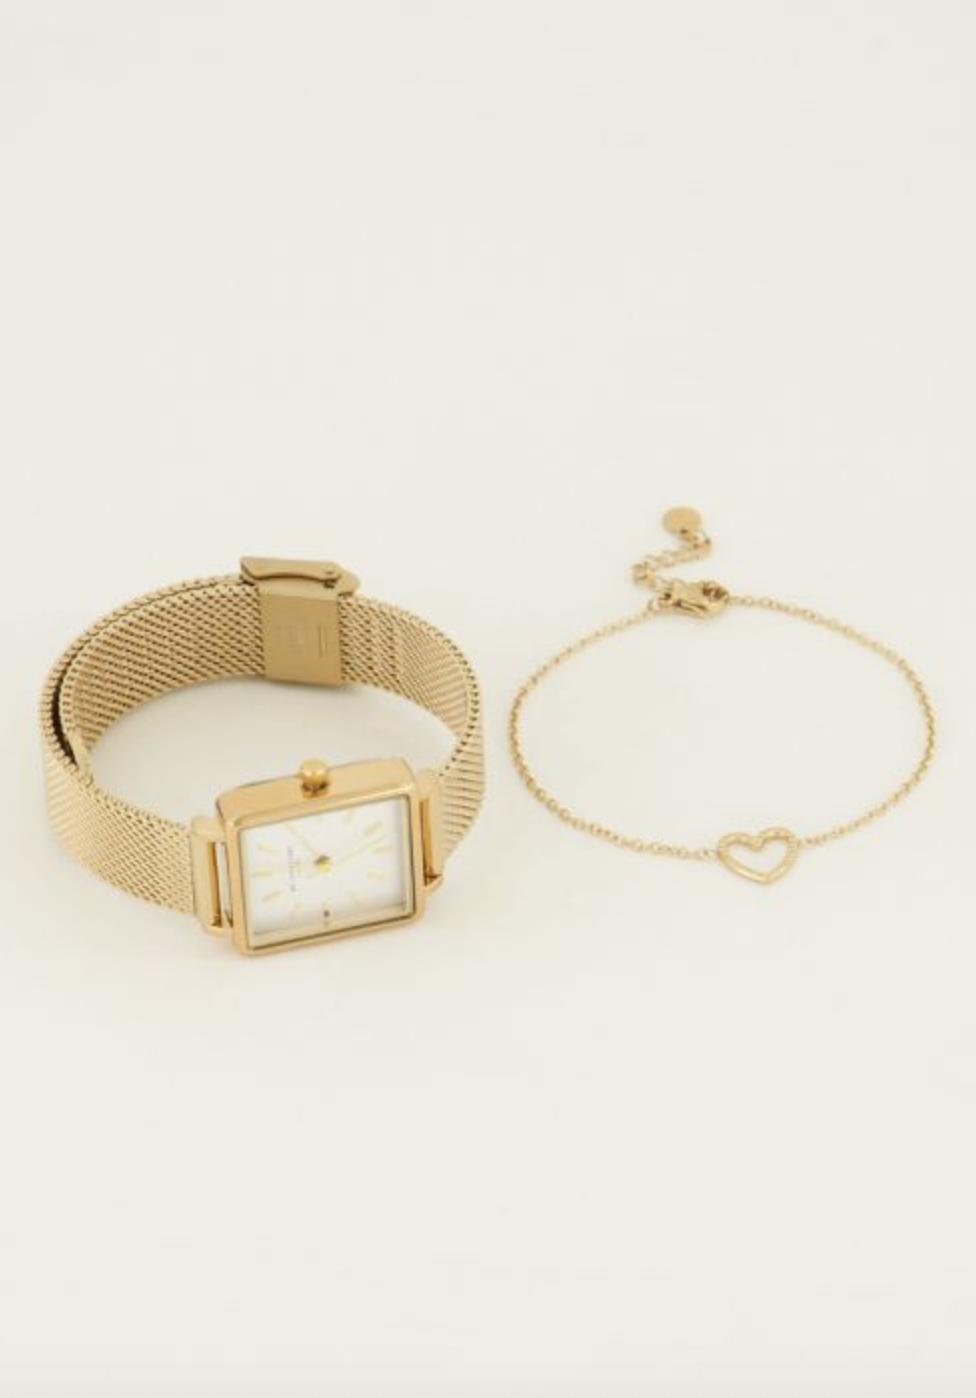 MY JEWELLERY MY JEWELLERY - Giftbox horloge & hartjes armbandje